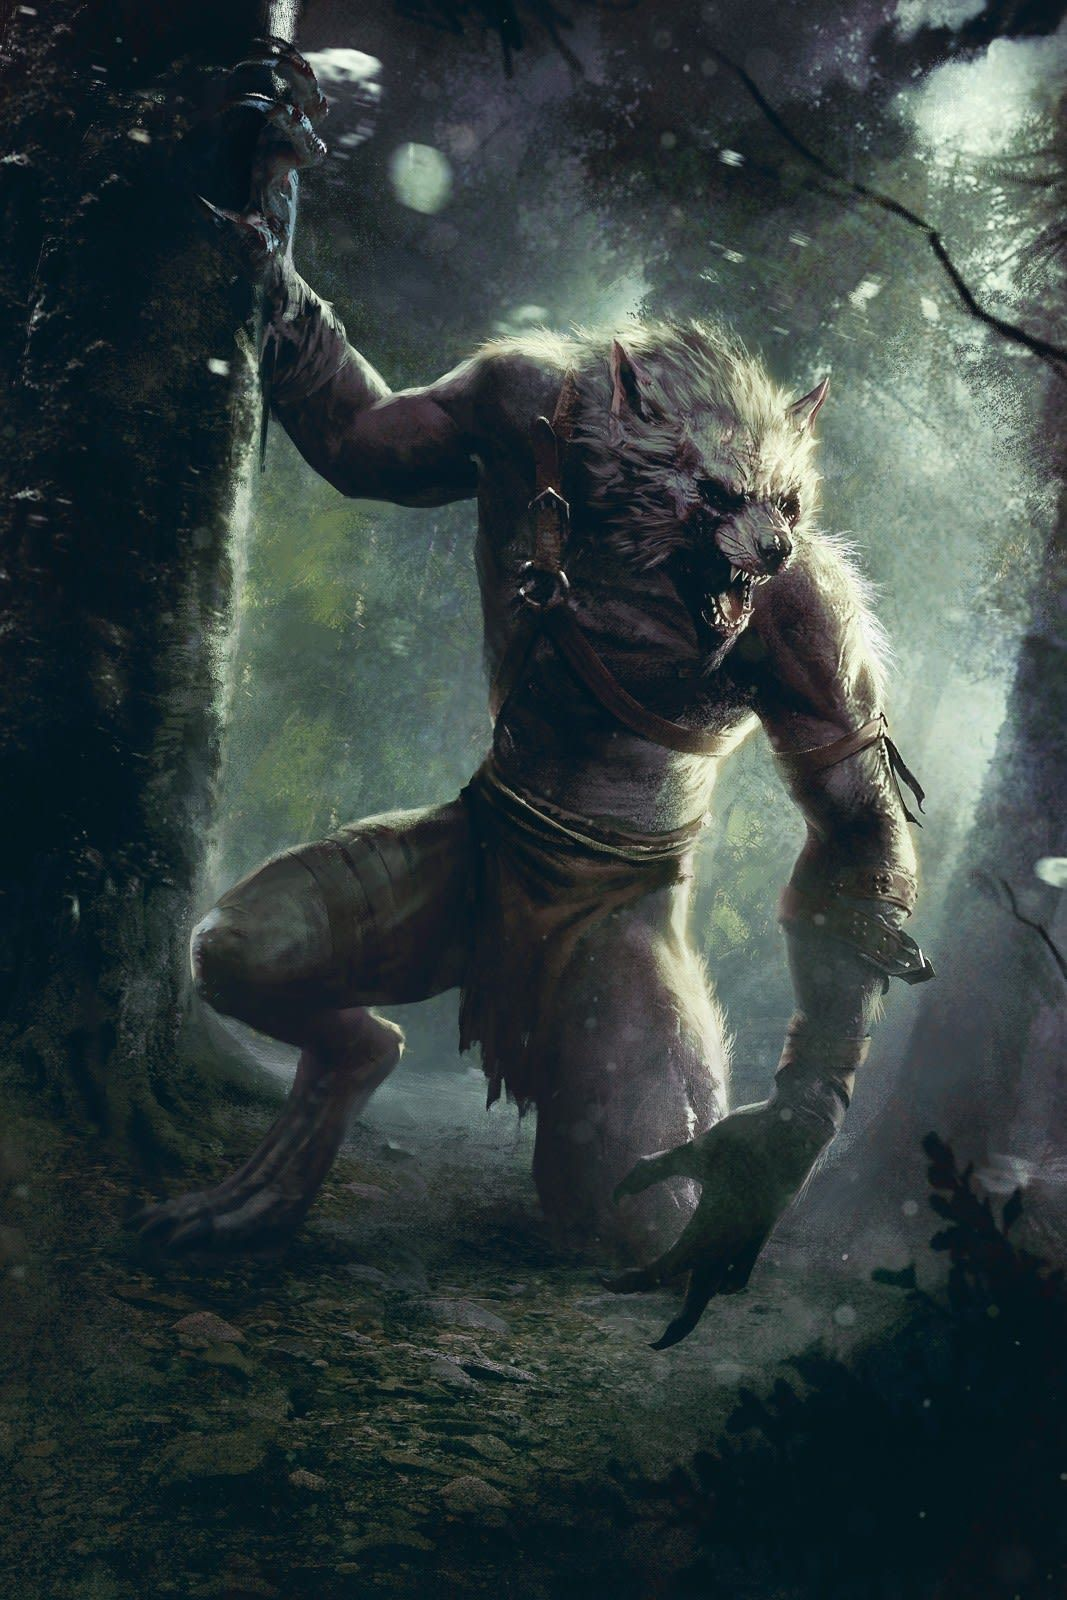 The Witcher 3 Loup Garou : witcher, garou, Татуировка